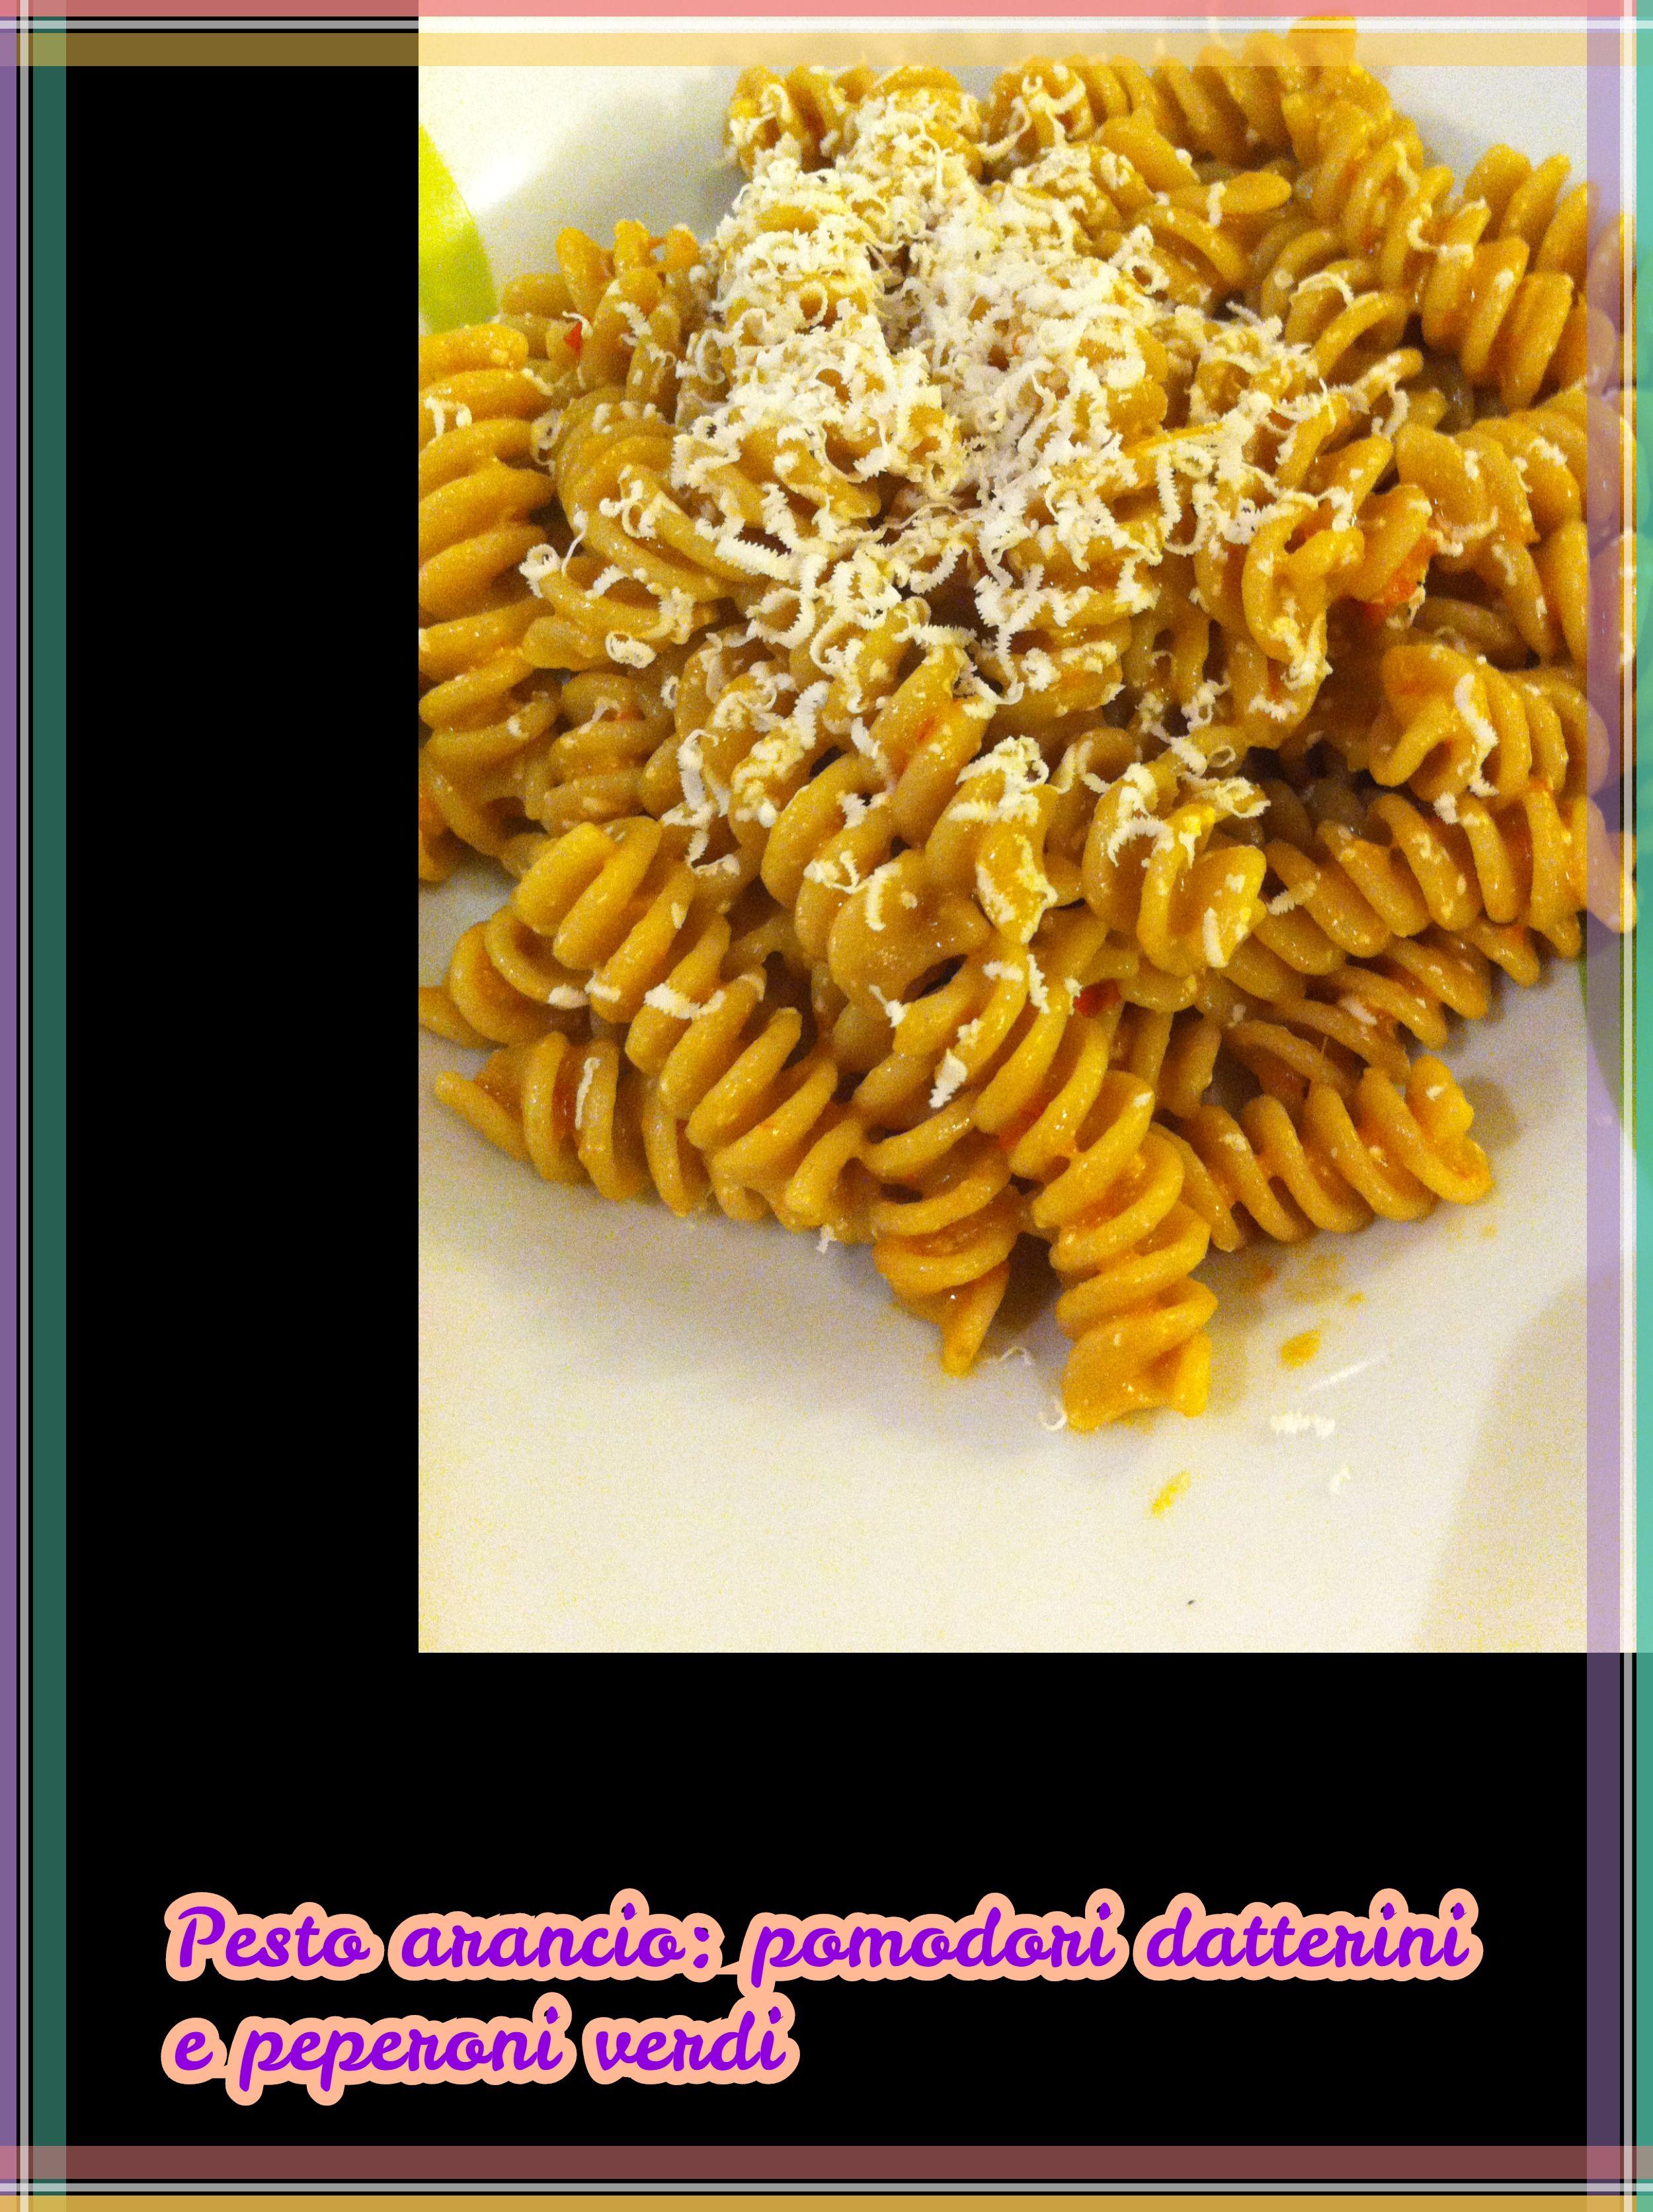 Pesto arancio (pomodori e peperoni verdi)